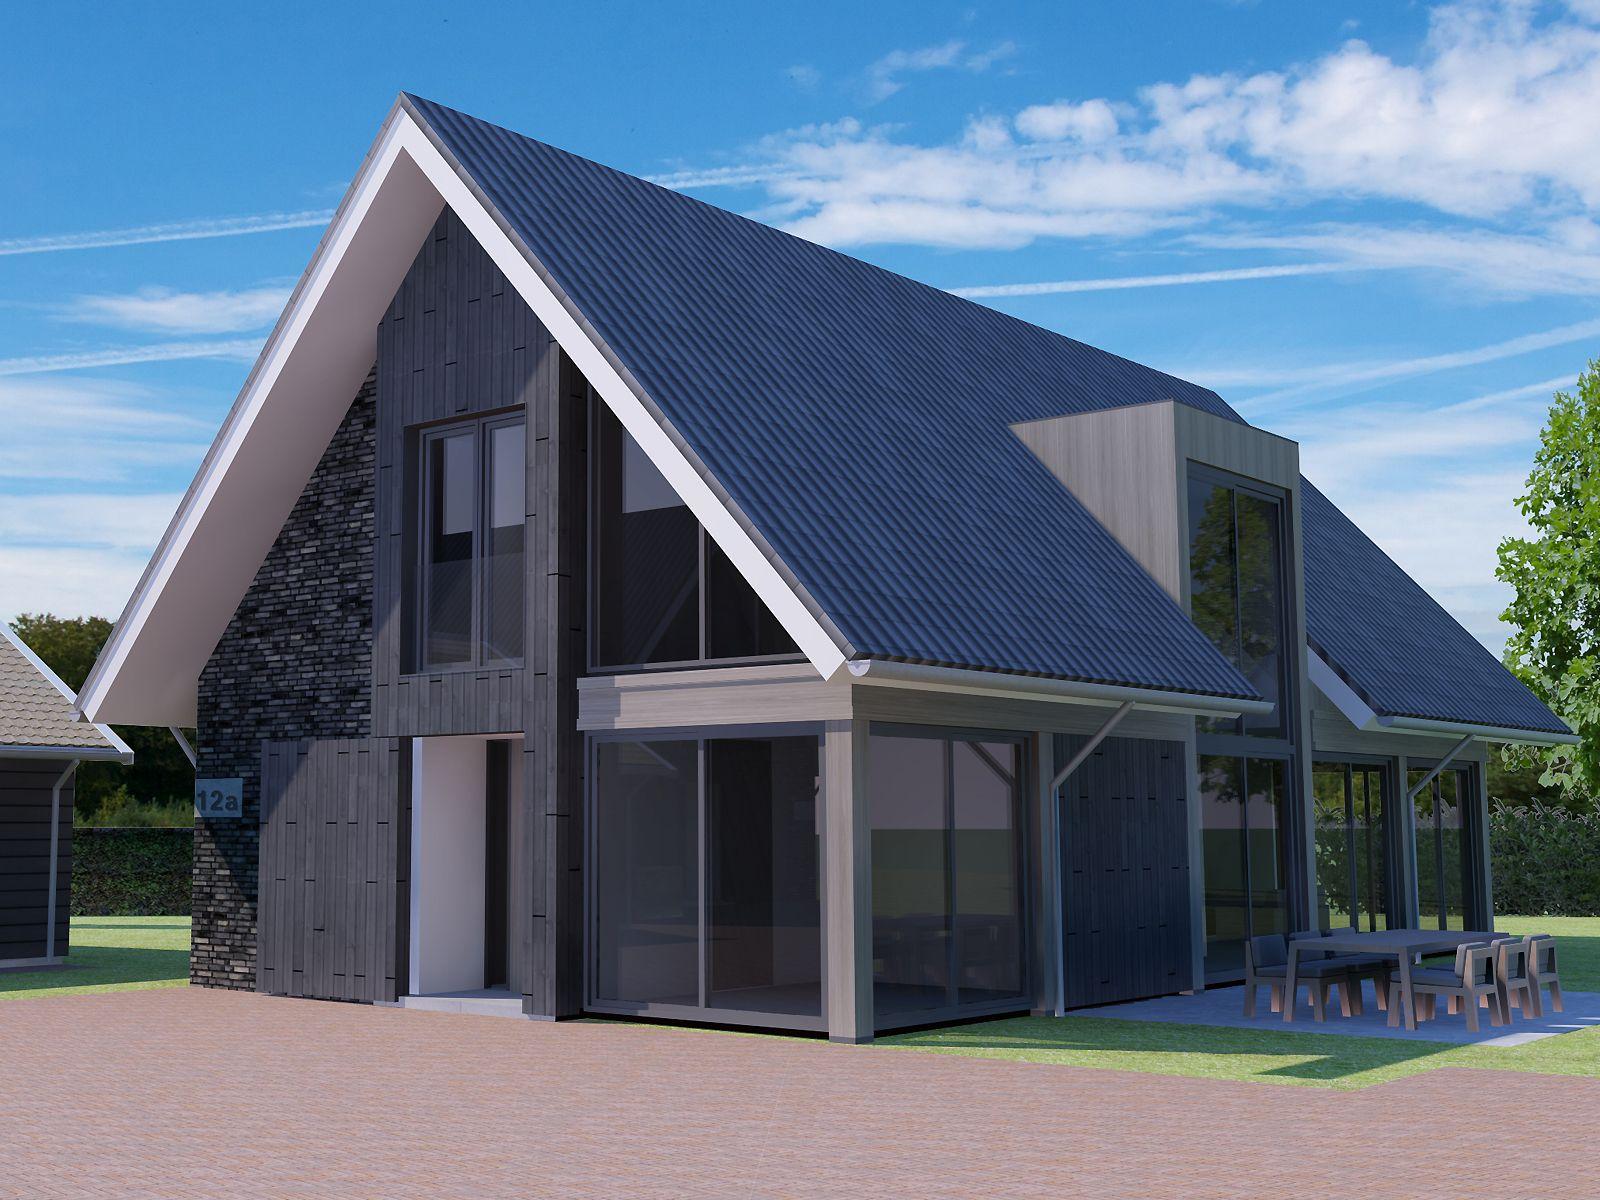 Impressie vrijstaande woning building design architectuur for Huizen architectuur